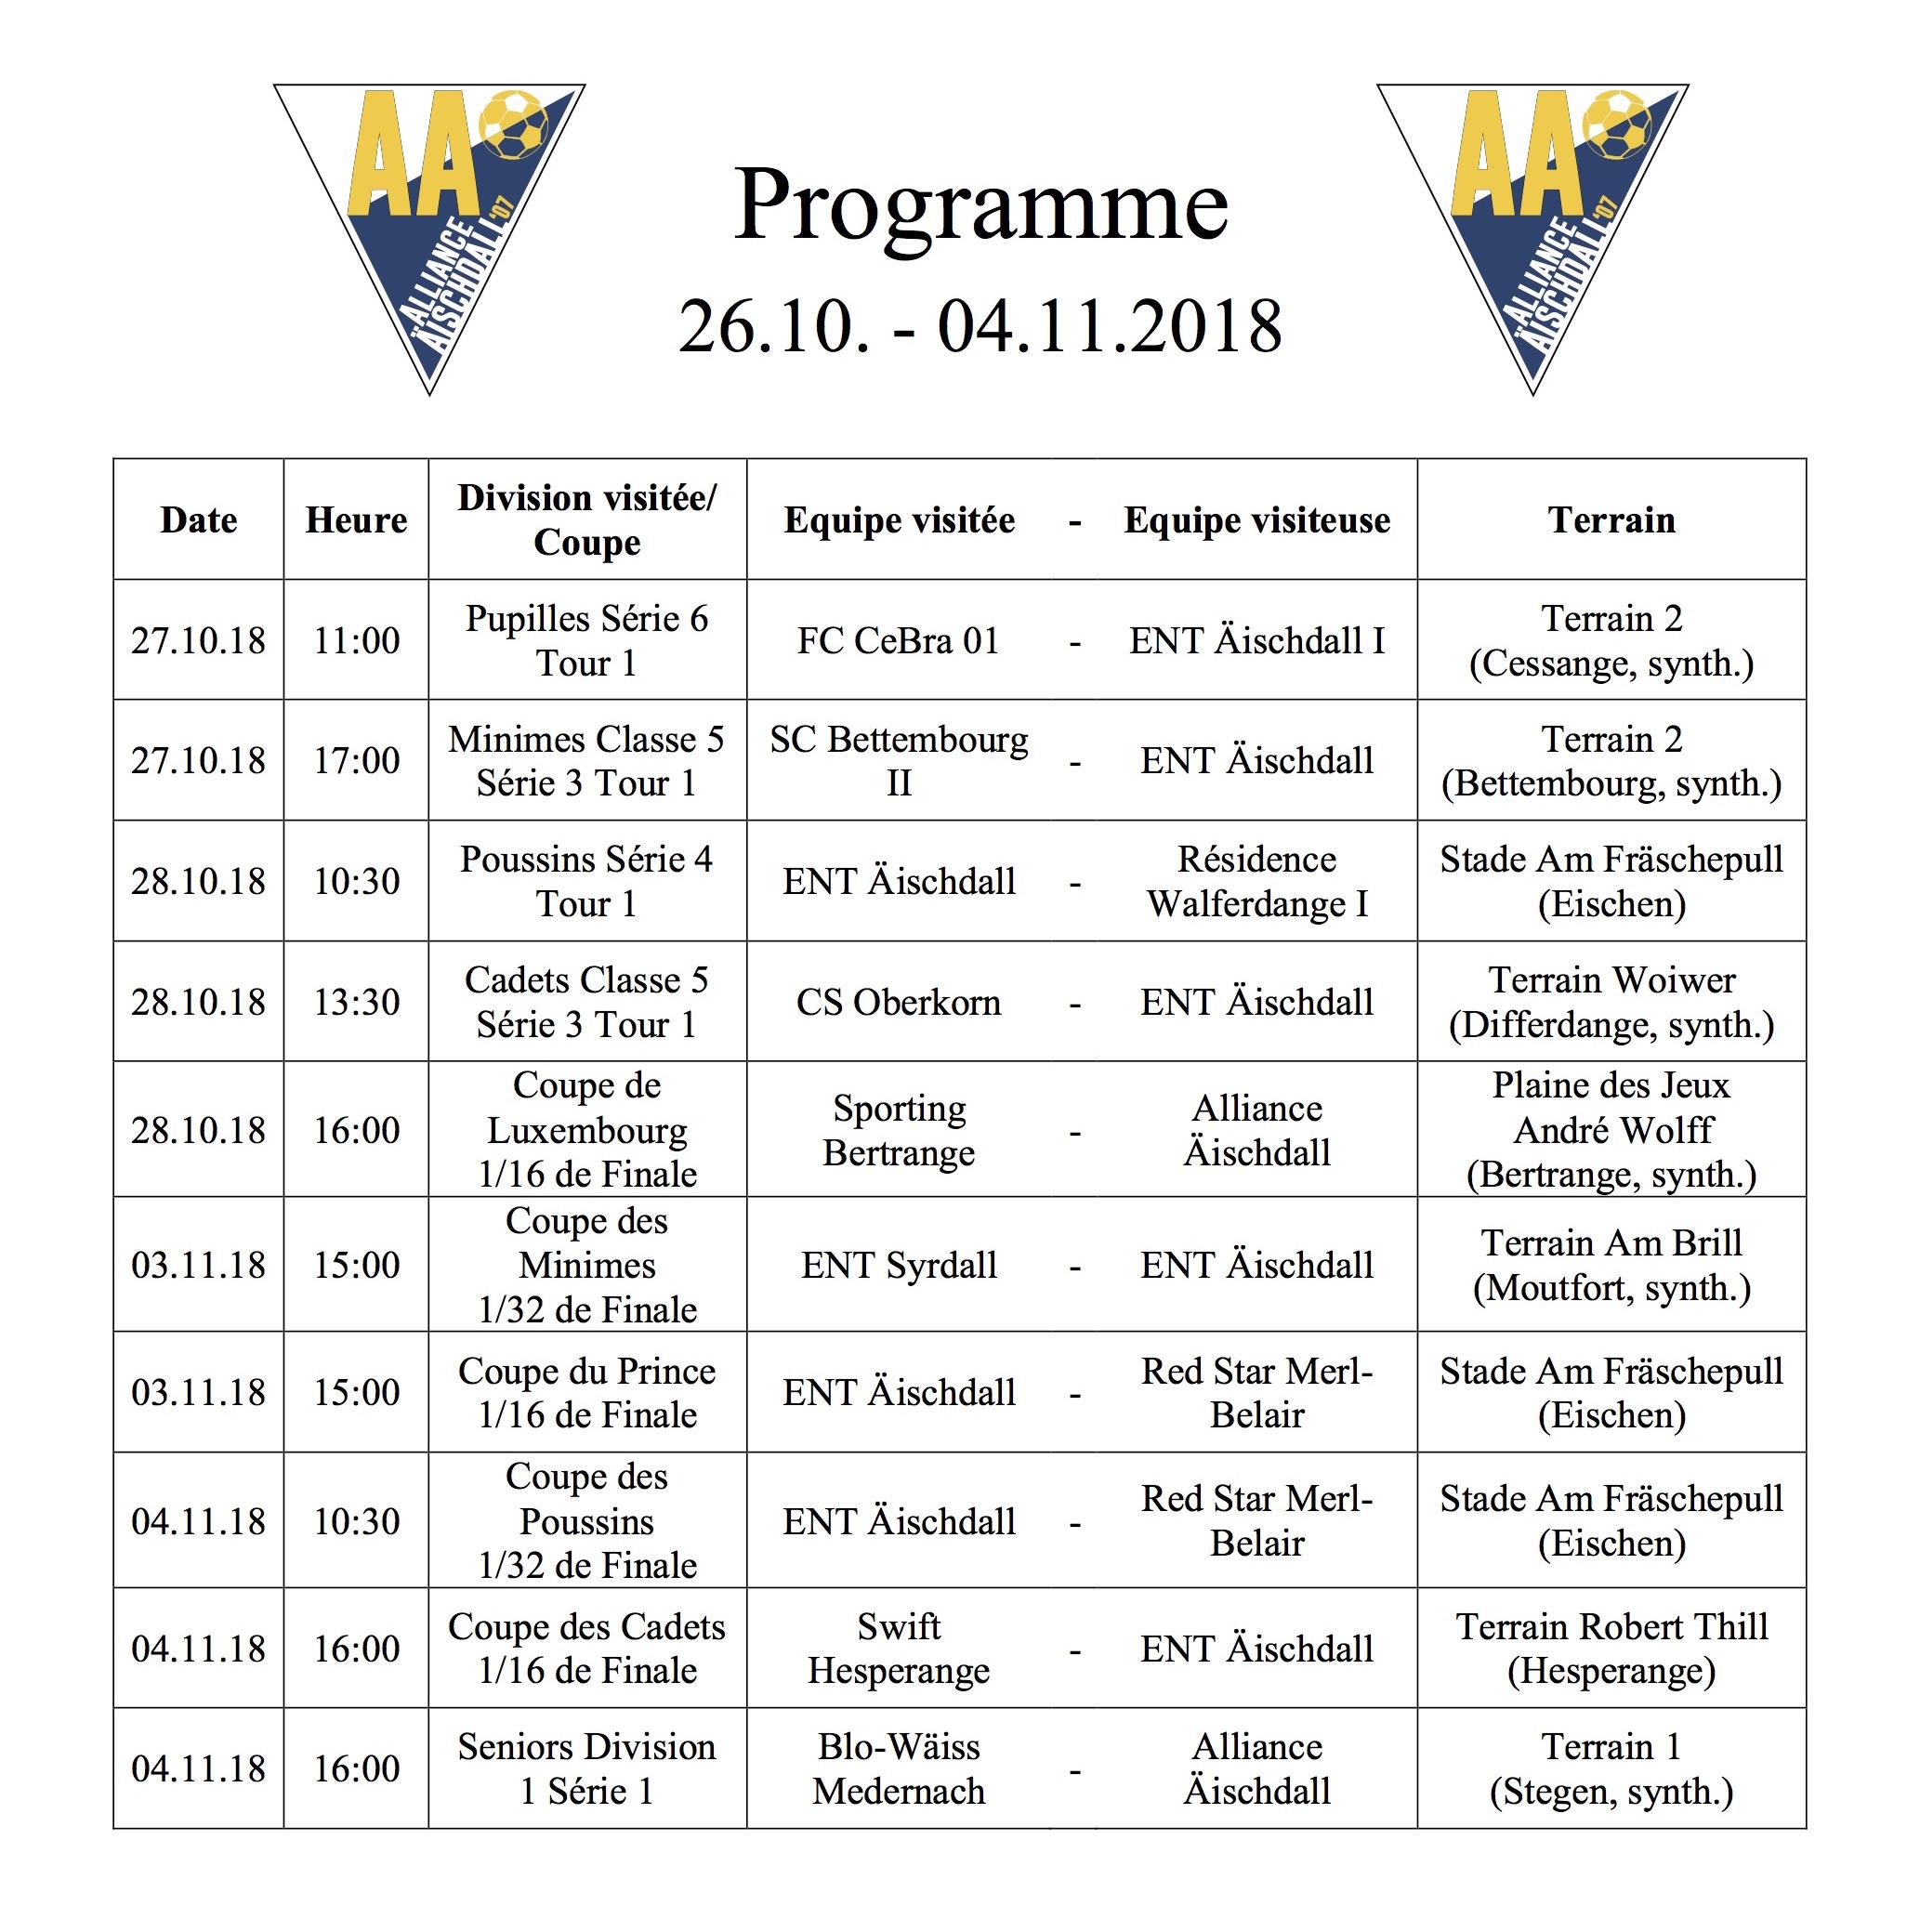 Programm 26.10.-04.11.2018